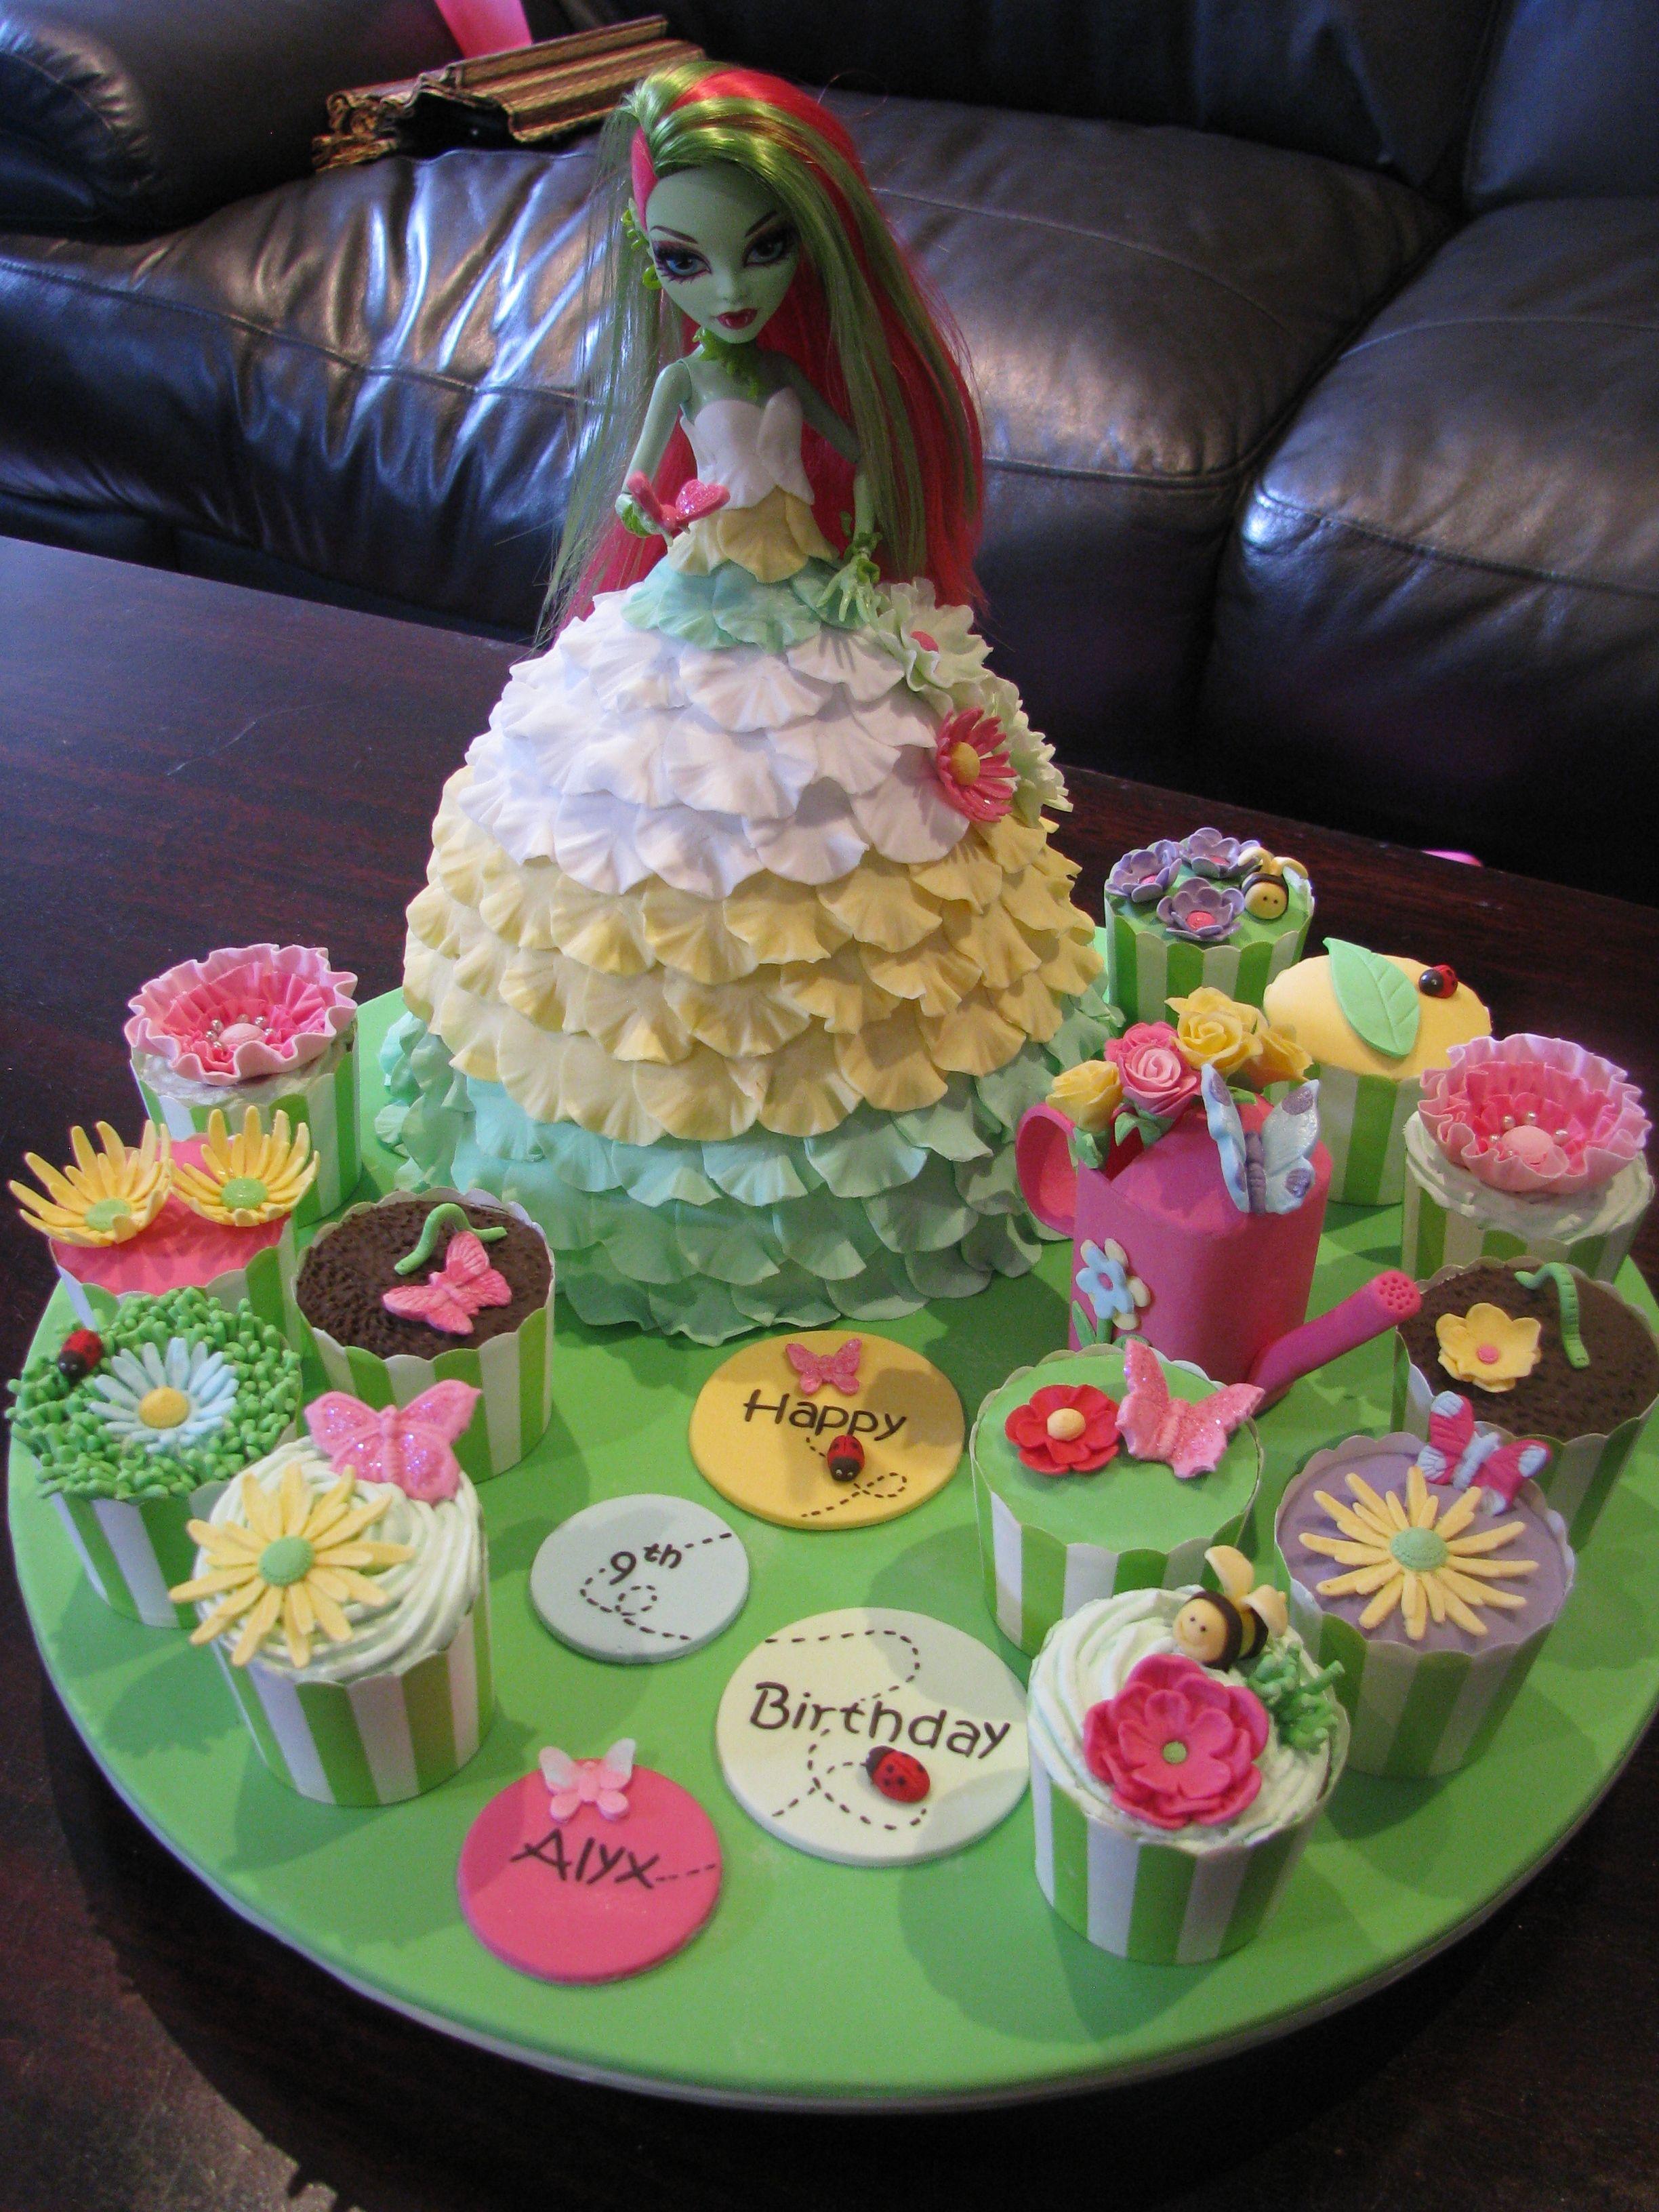 Astounding Venus Mcflytrap Doll Cake Doll Cake Monster High Cakes Personalised Birthday Cards Sponlily Jamesorg